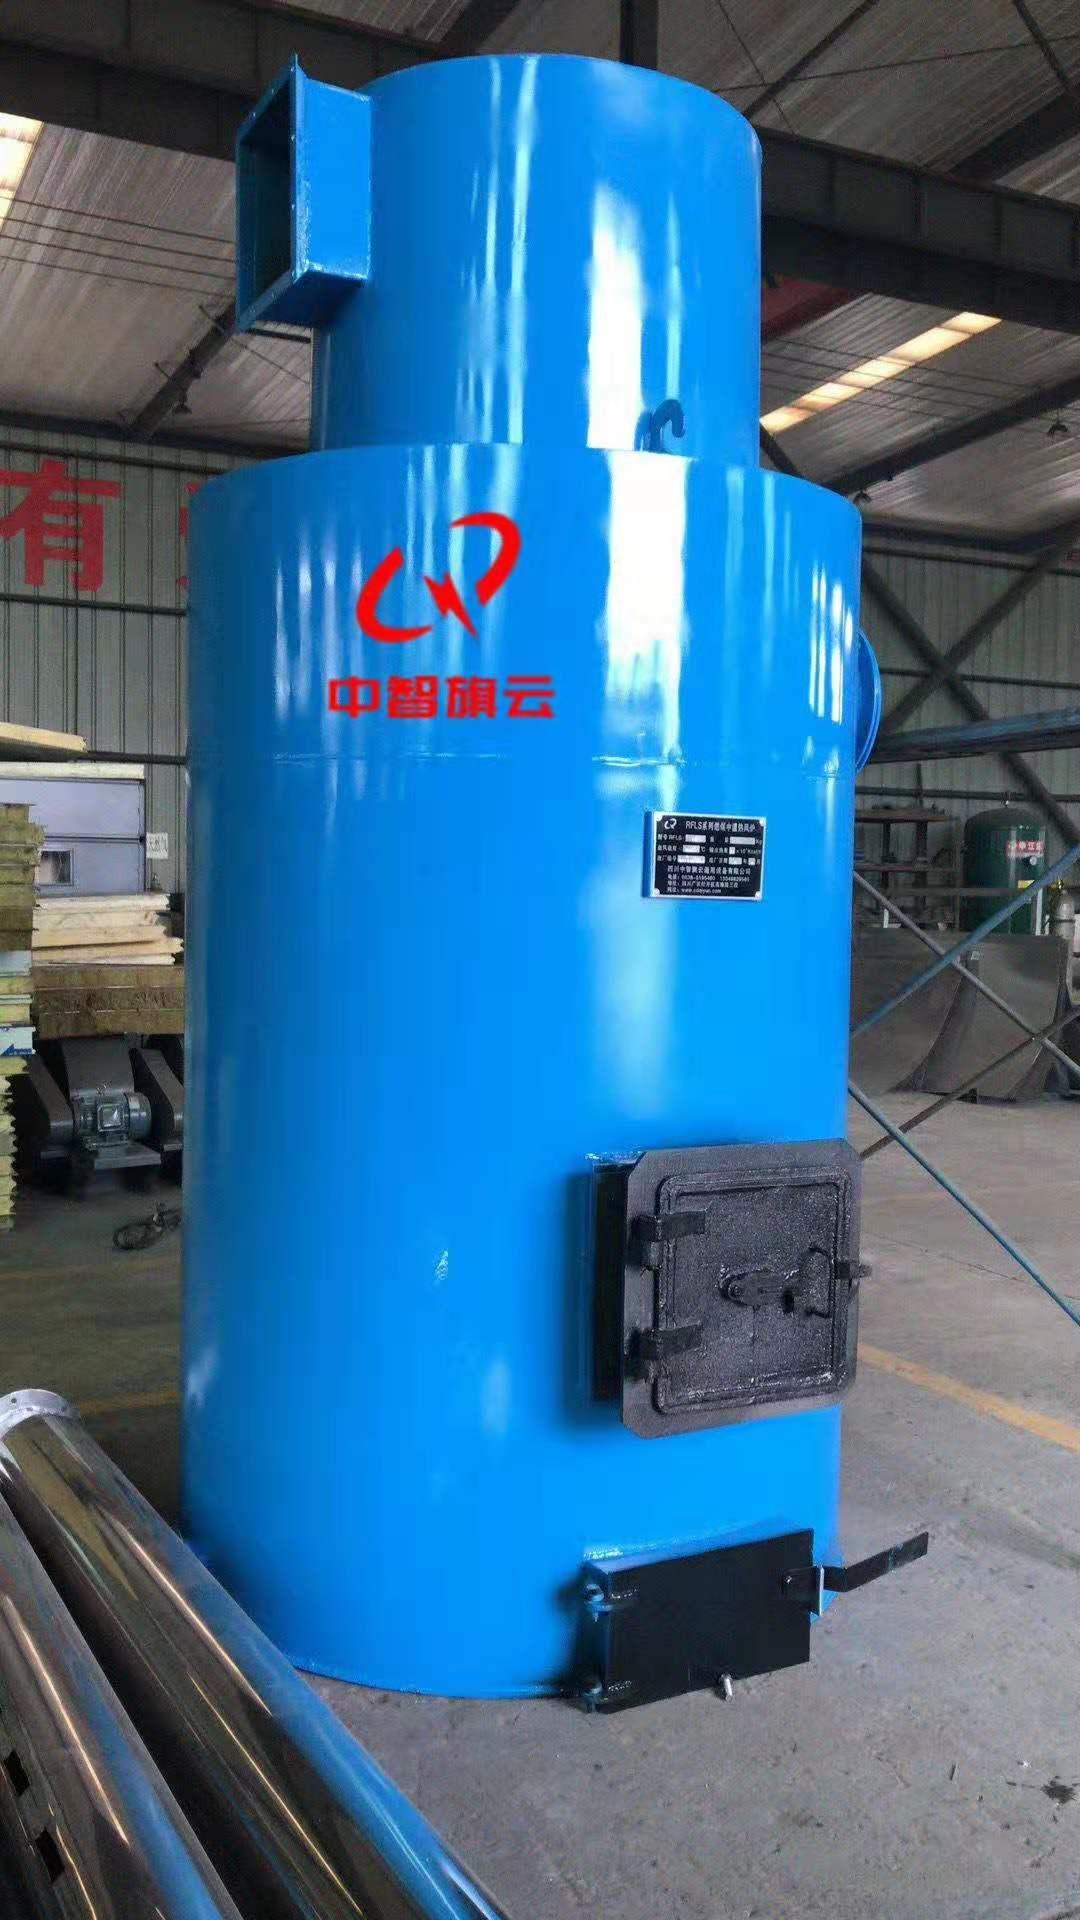 RFLS系列燃煤中温间接热风炉